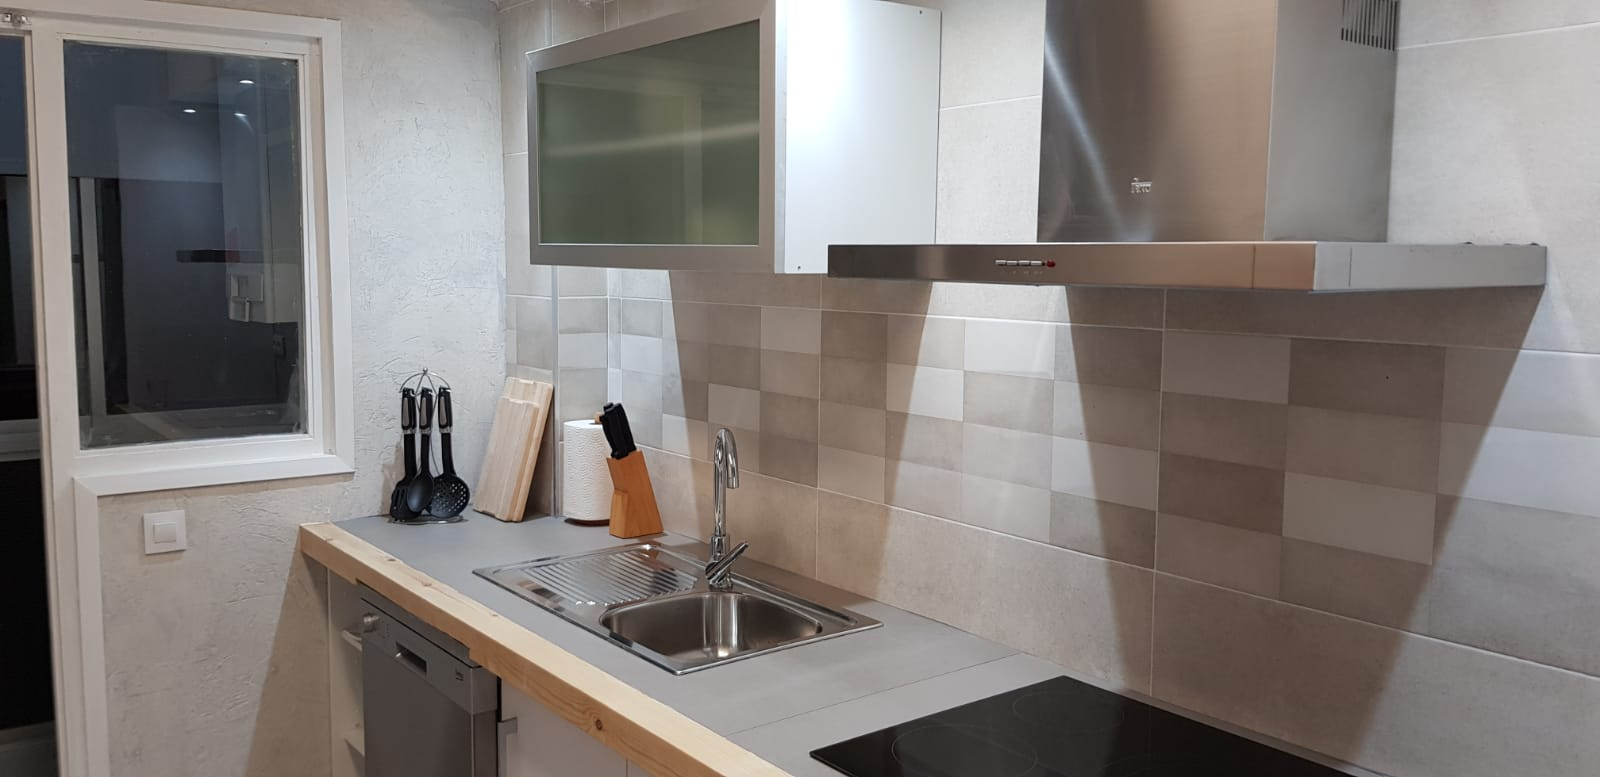 Cocina apartamento Casa Pilarcho